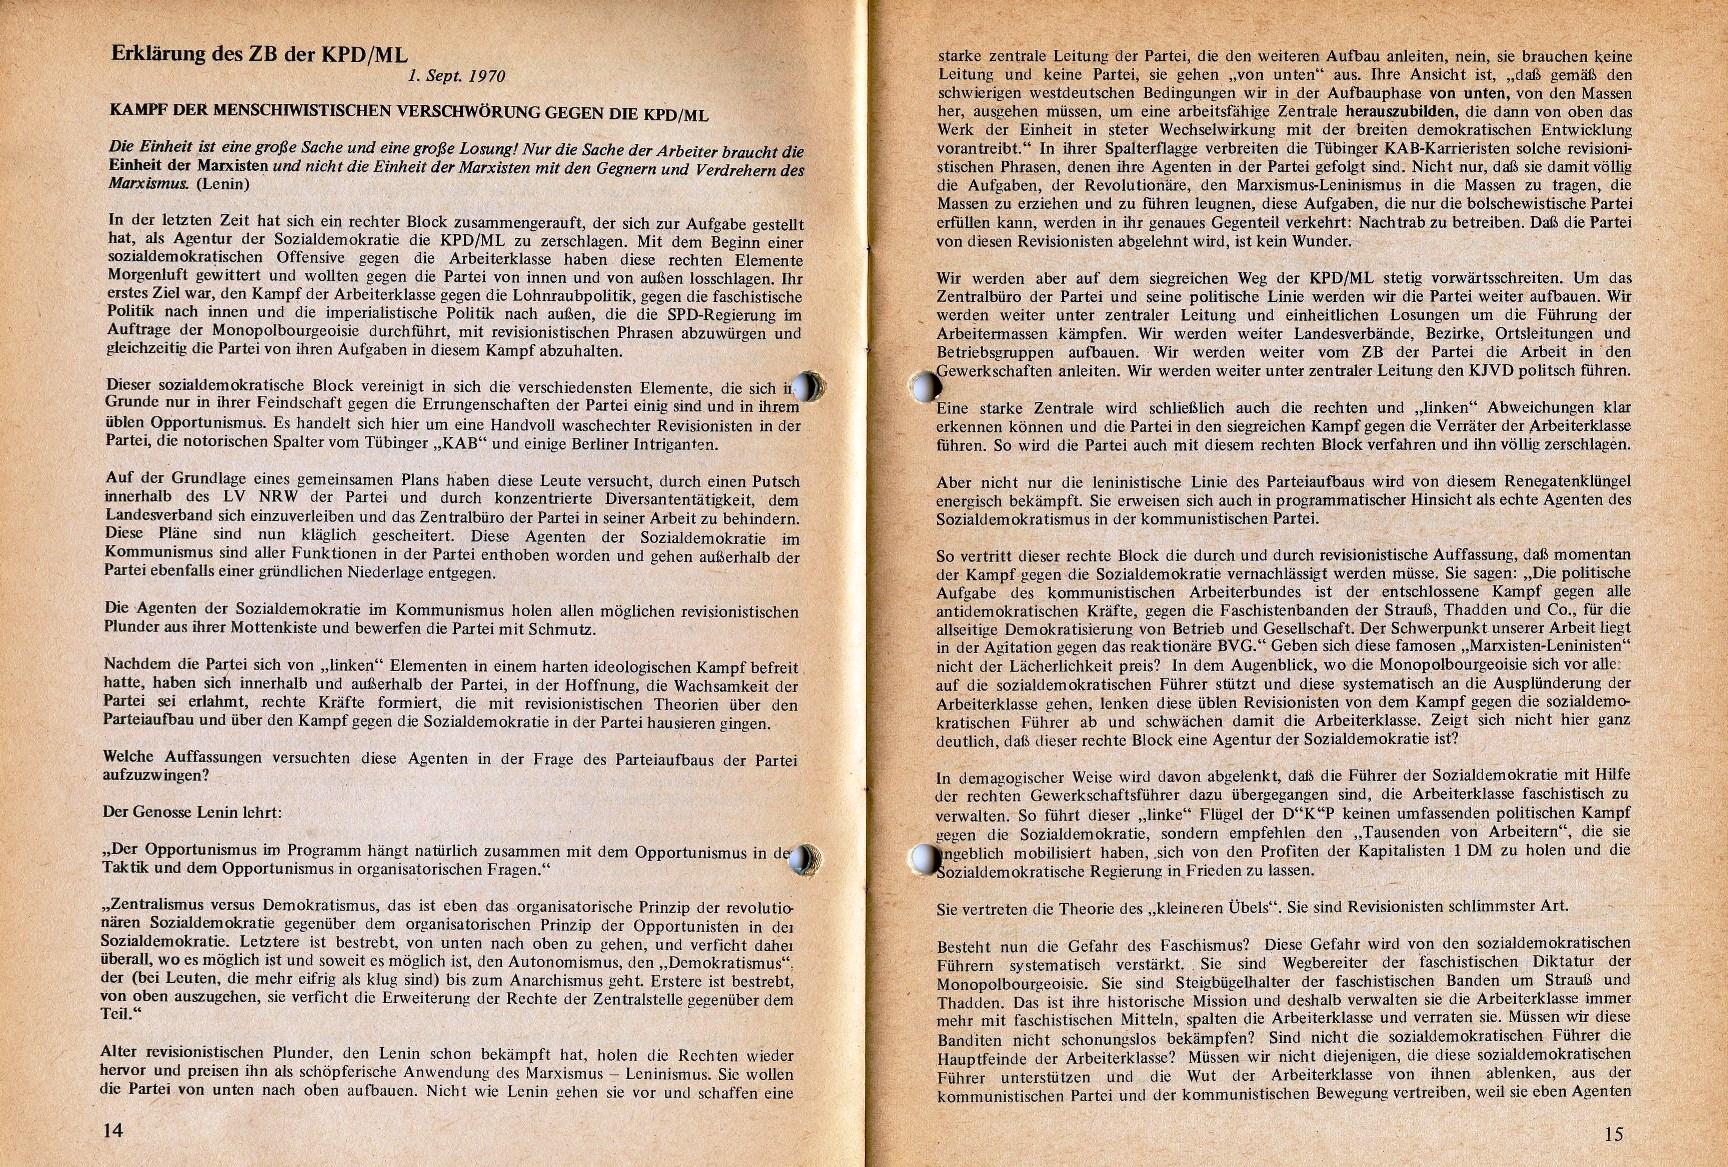 ZB_Parteiarbeiter_1970_02_09